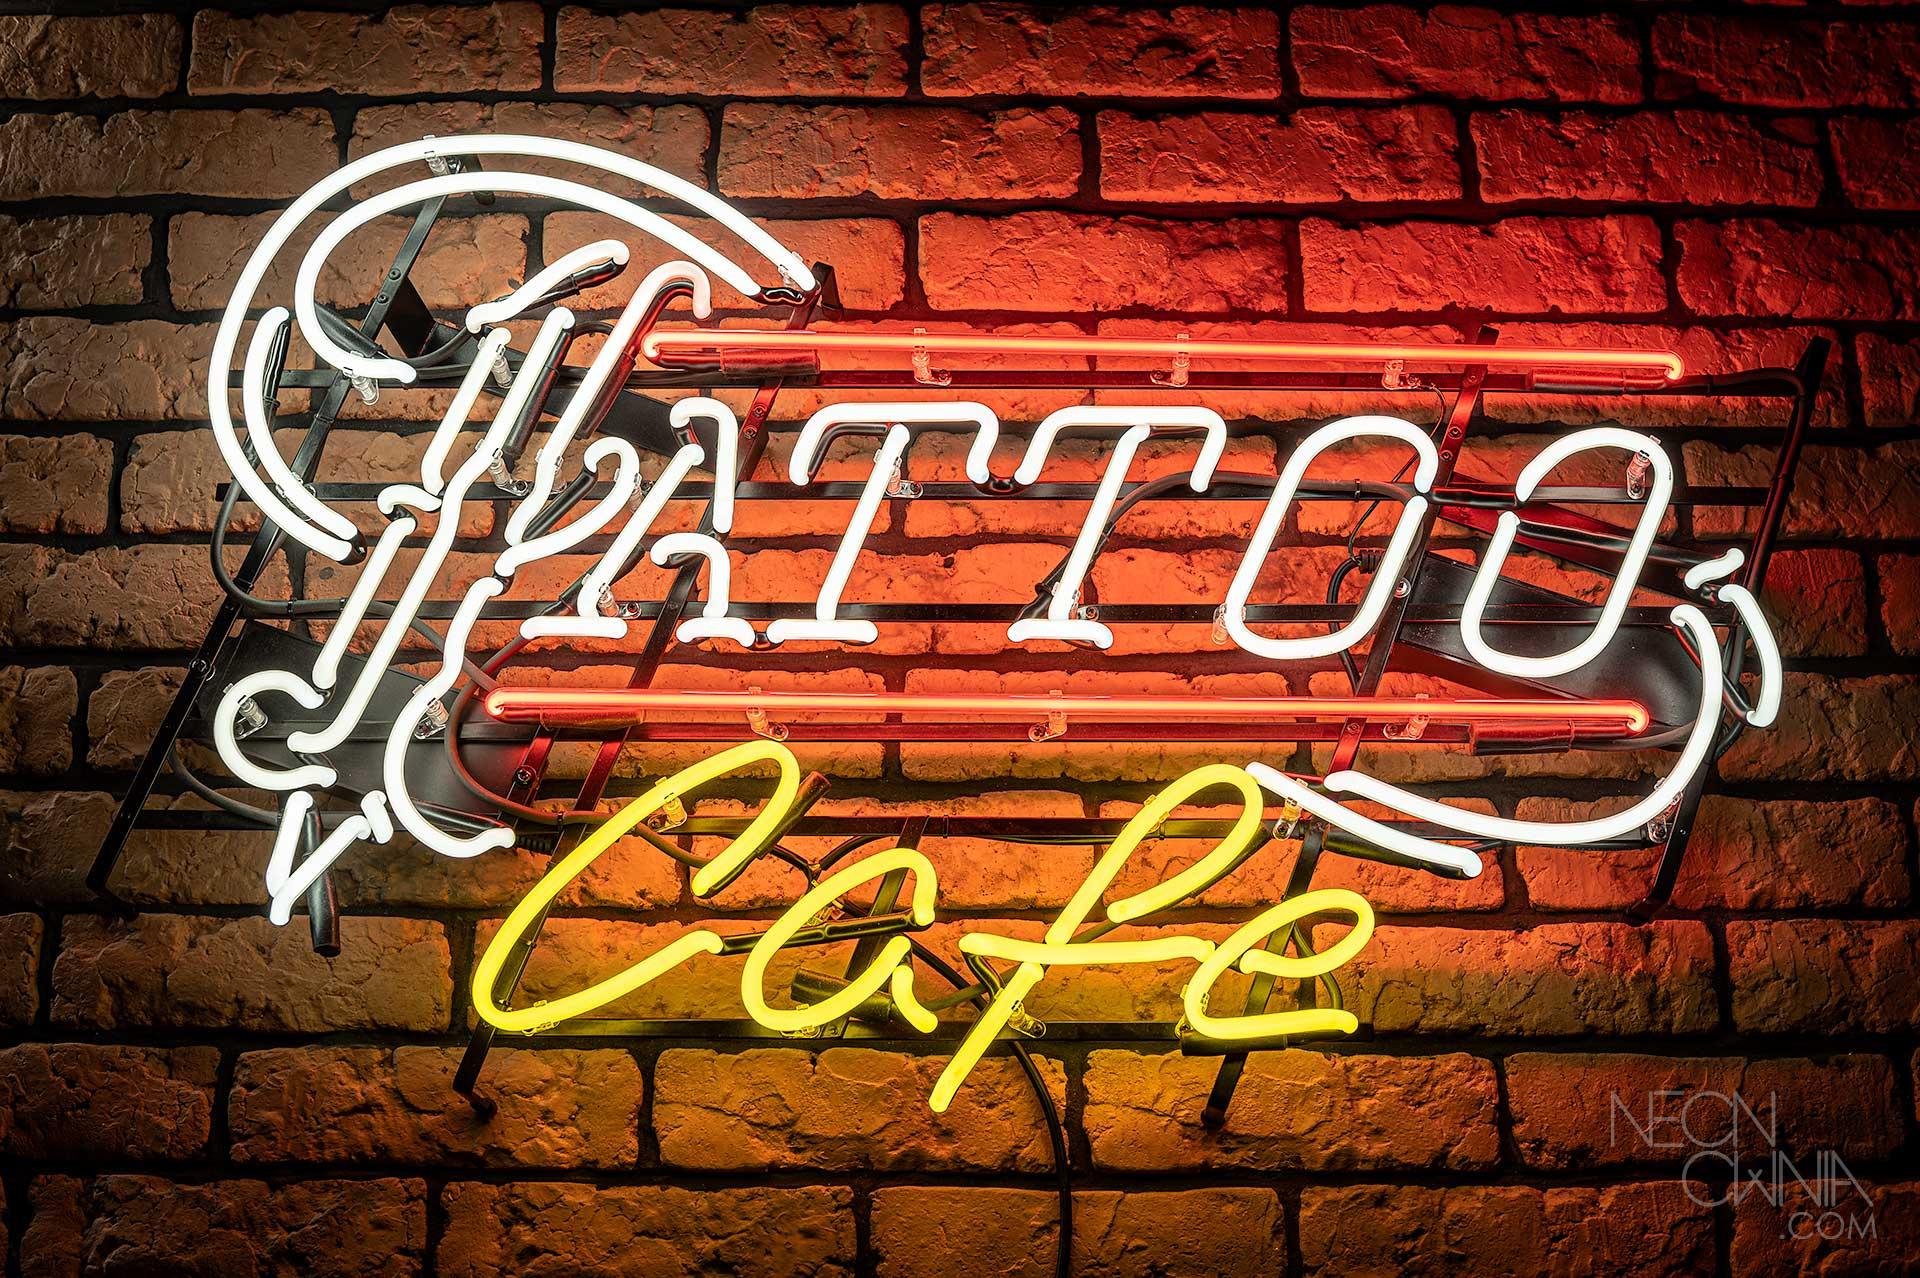 TATTOO CAFE